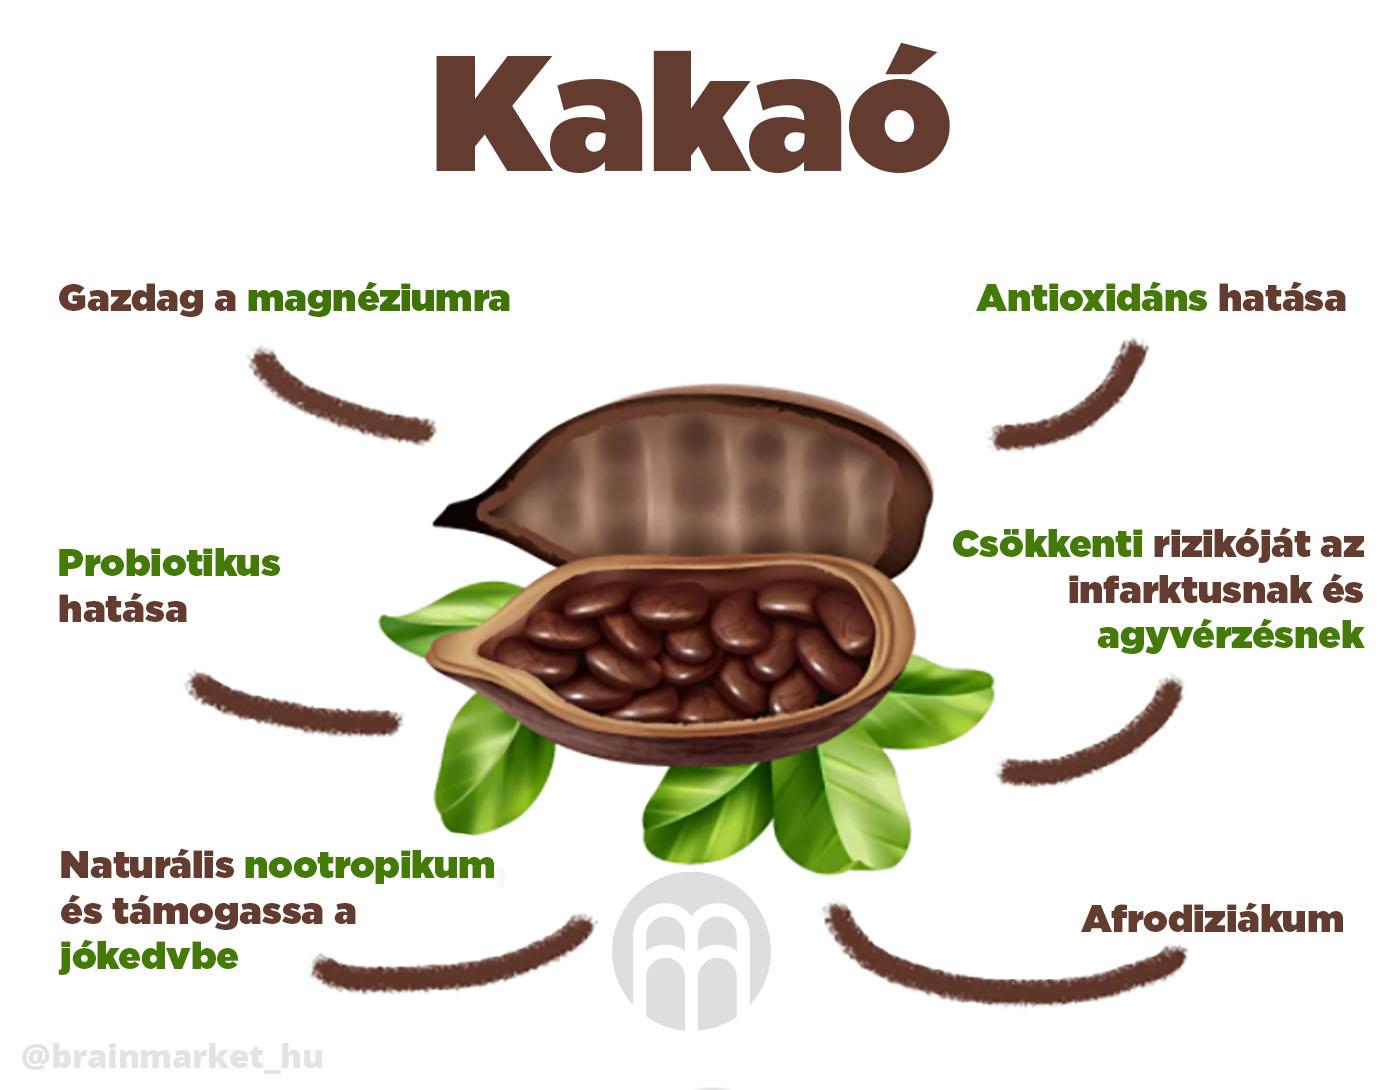 kakao_infografika_brainmarket_hu_1